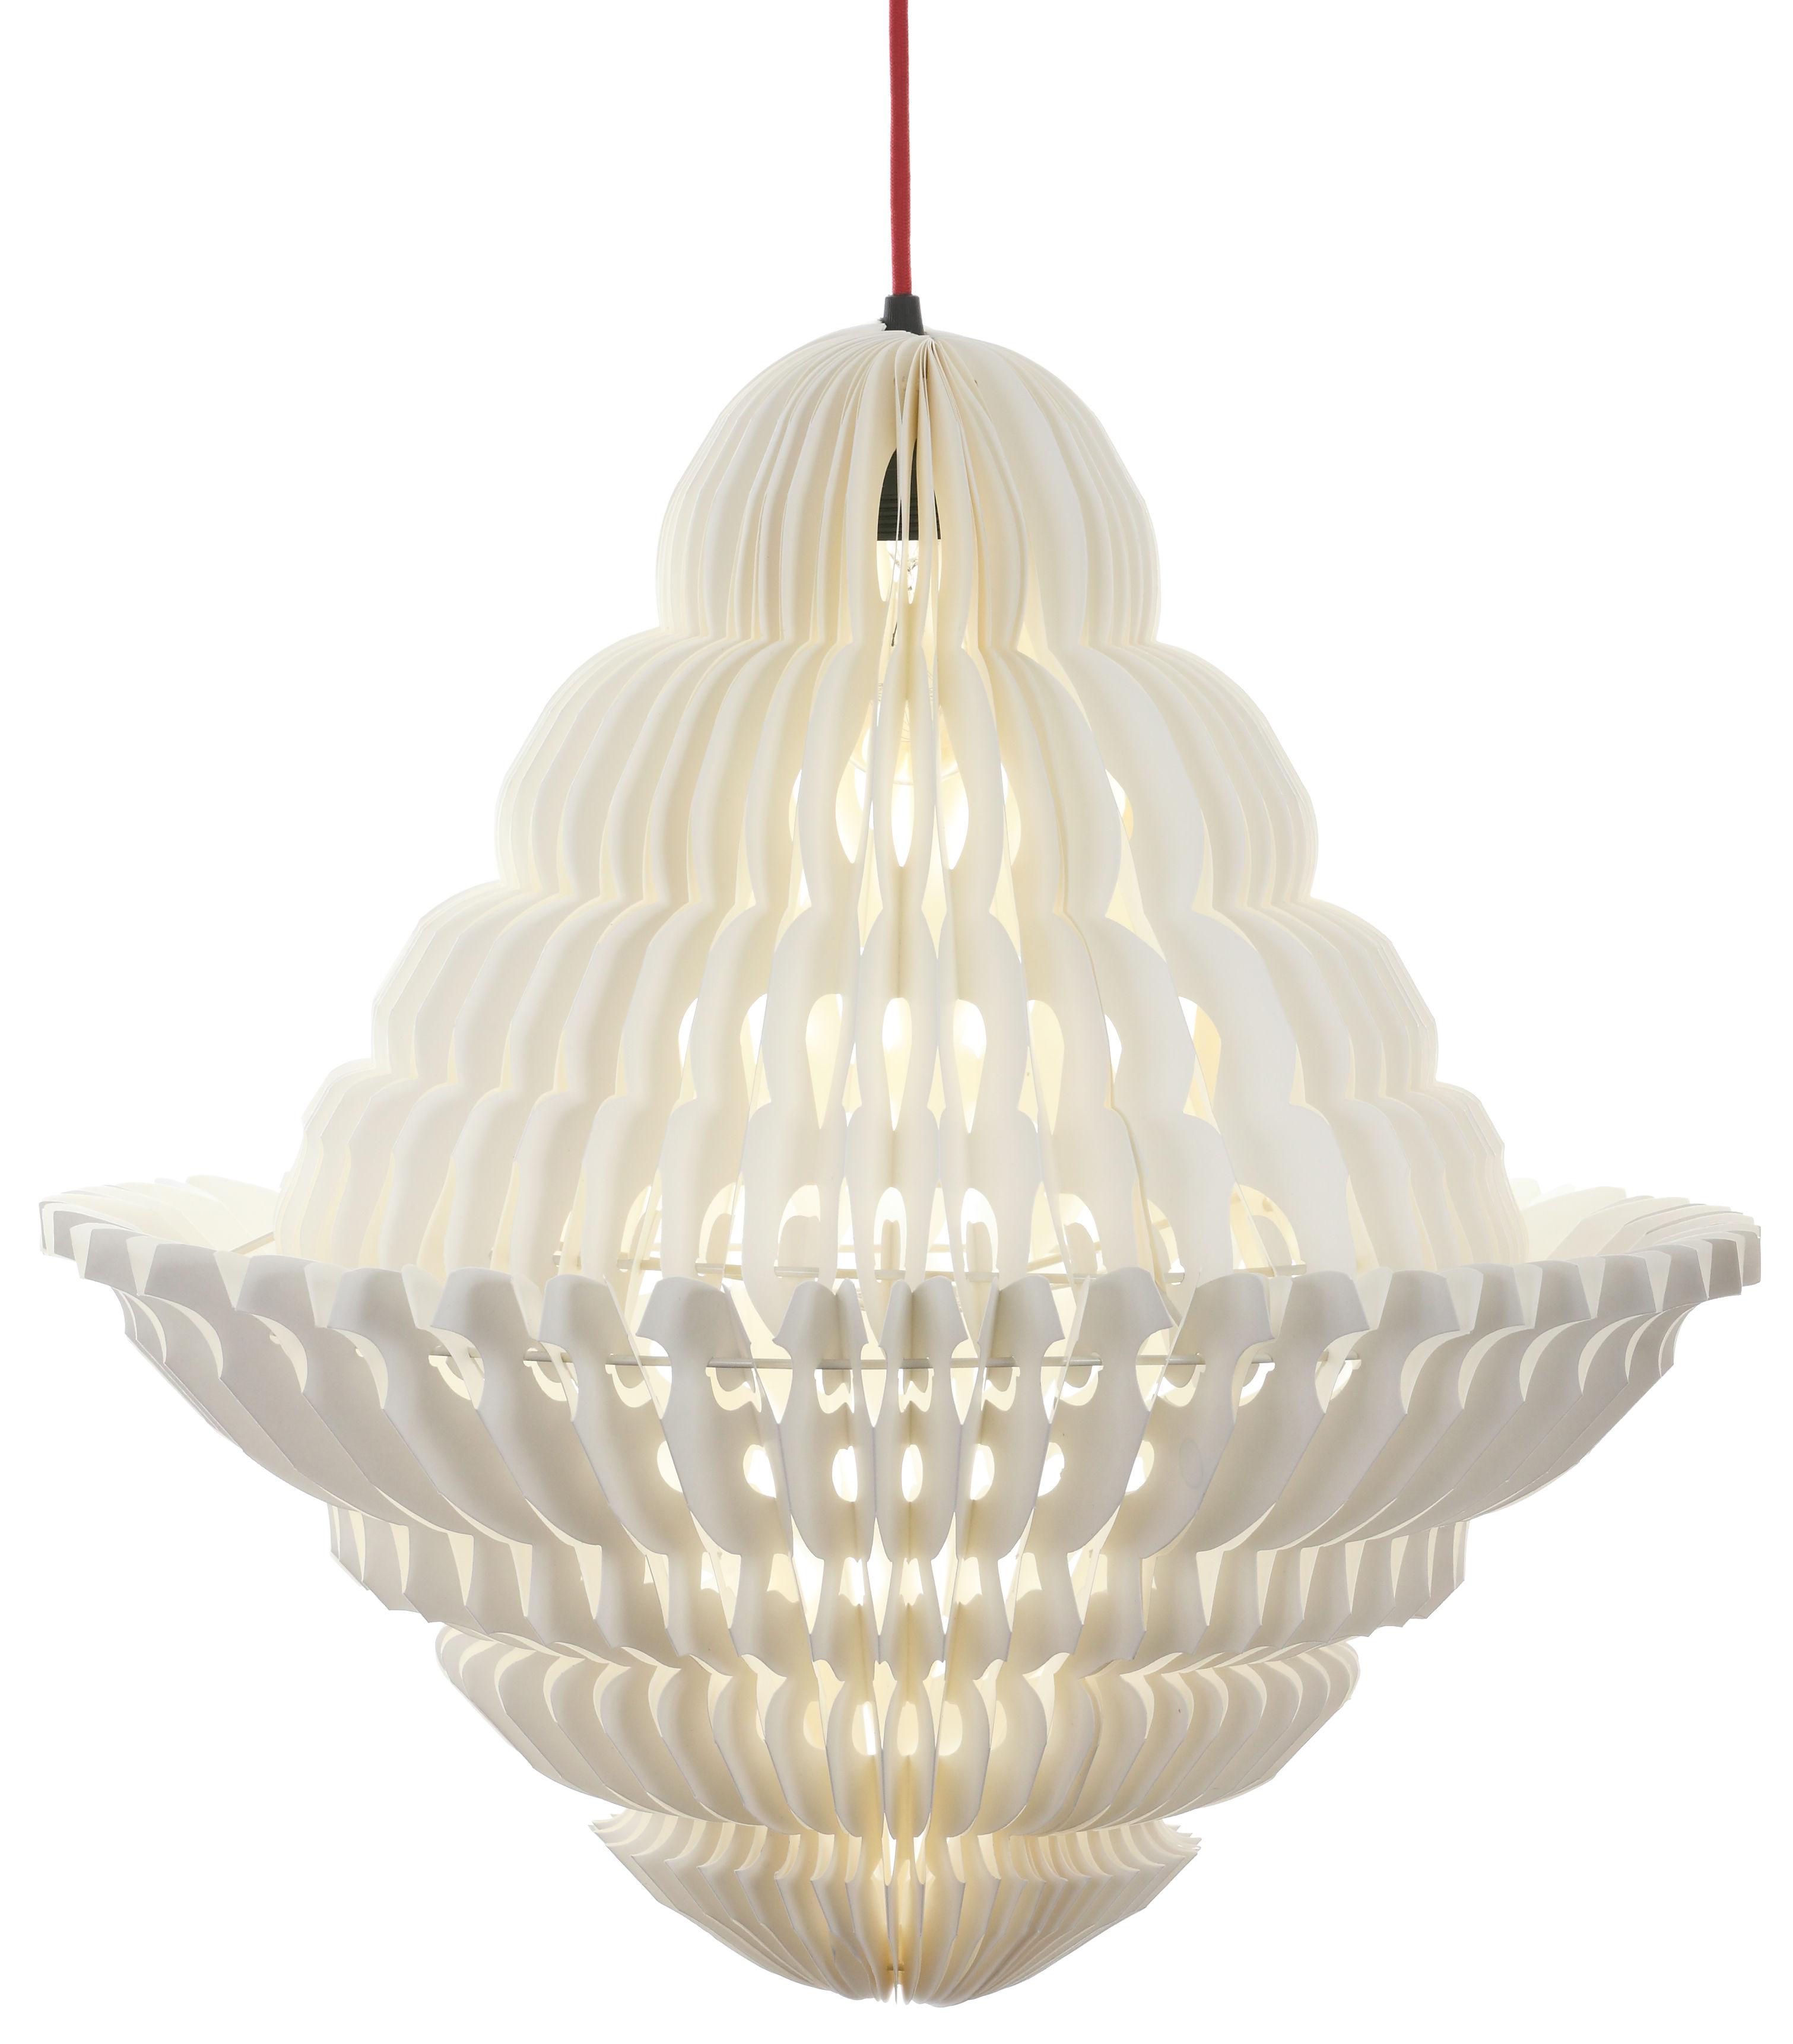 Illuminazione - Lampadari - Sospensione Paper Lustre - / Ø 46 x H 70 cm di Made in design Editions - Bianco / Cavo bianco - Carta